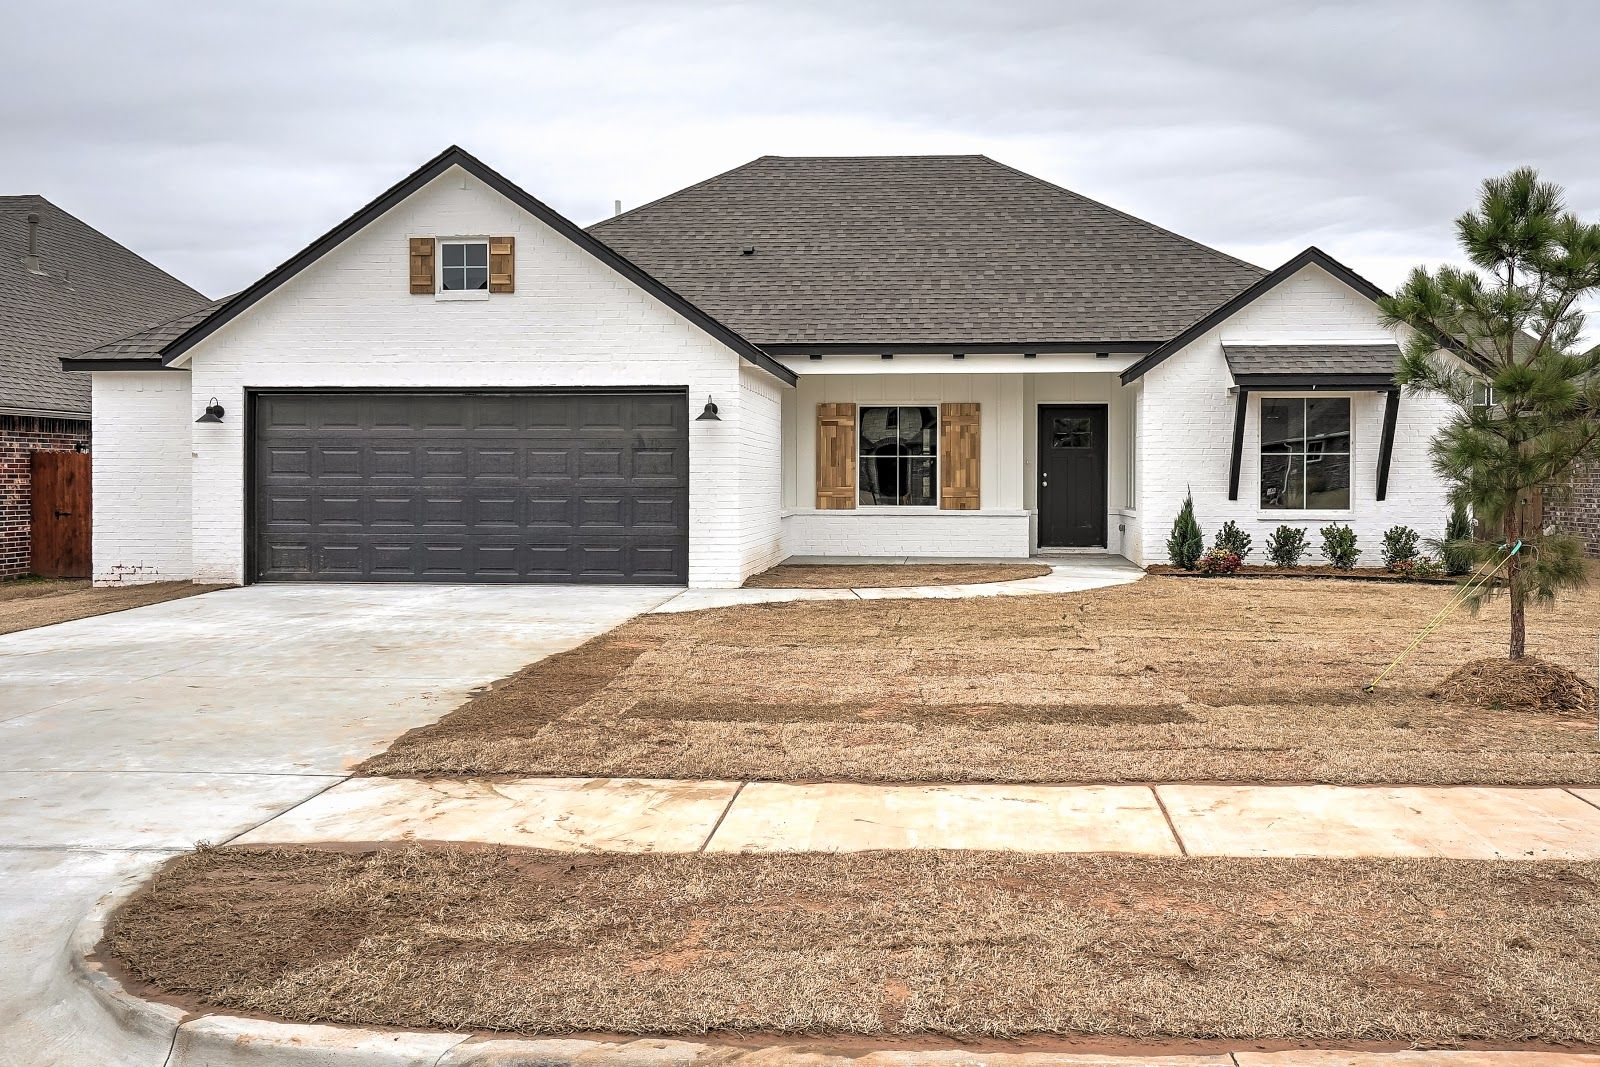 Tradition Homes - Oklahoma,74134